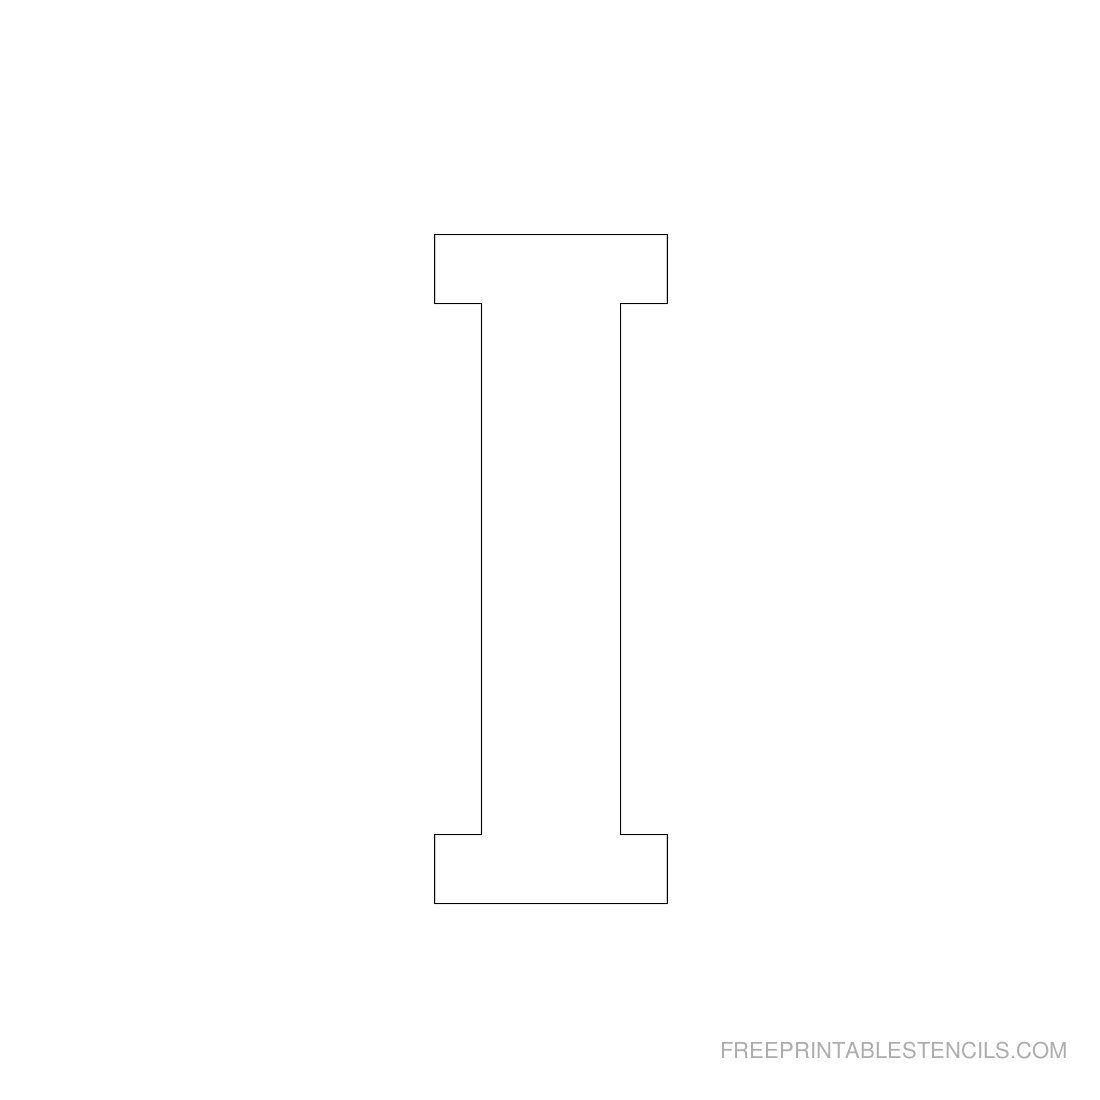 Printable 3 Inch Letter Stencils A Z Letter Stencils Stencils Printables Free Printable Letter Stencils